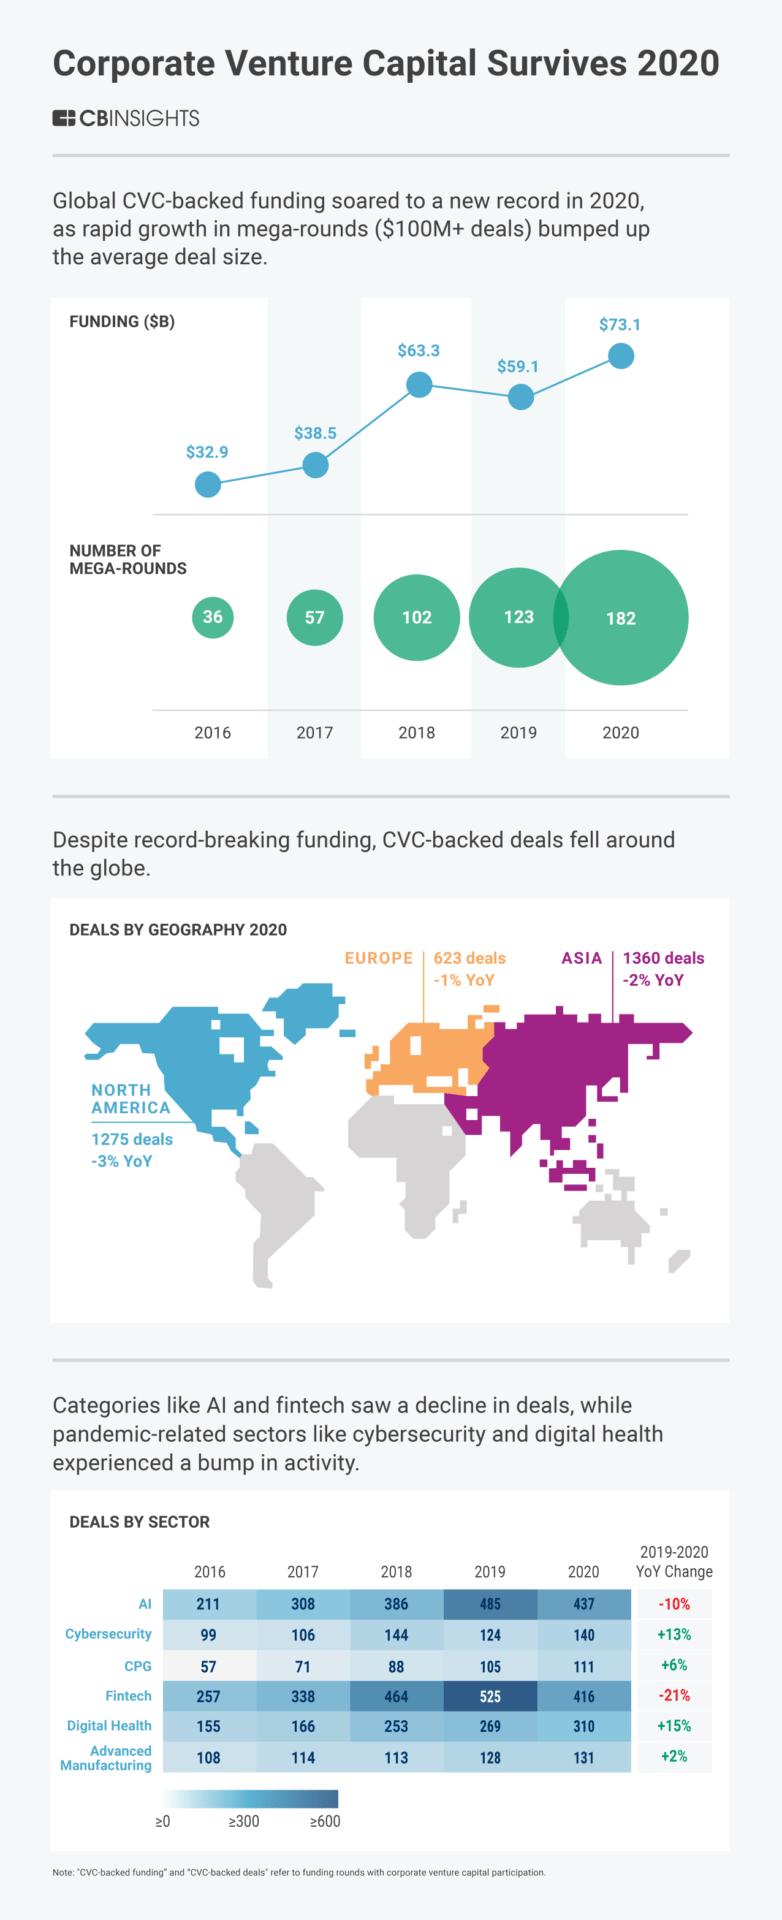 Data on corporate venture capital funding in 2020 around the world